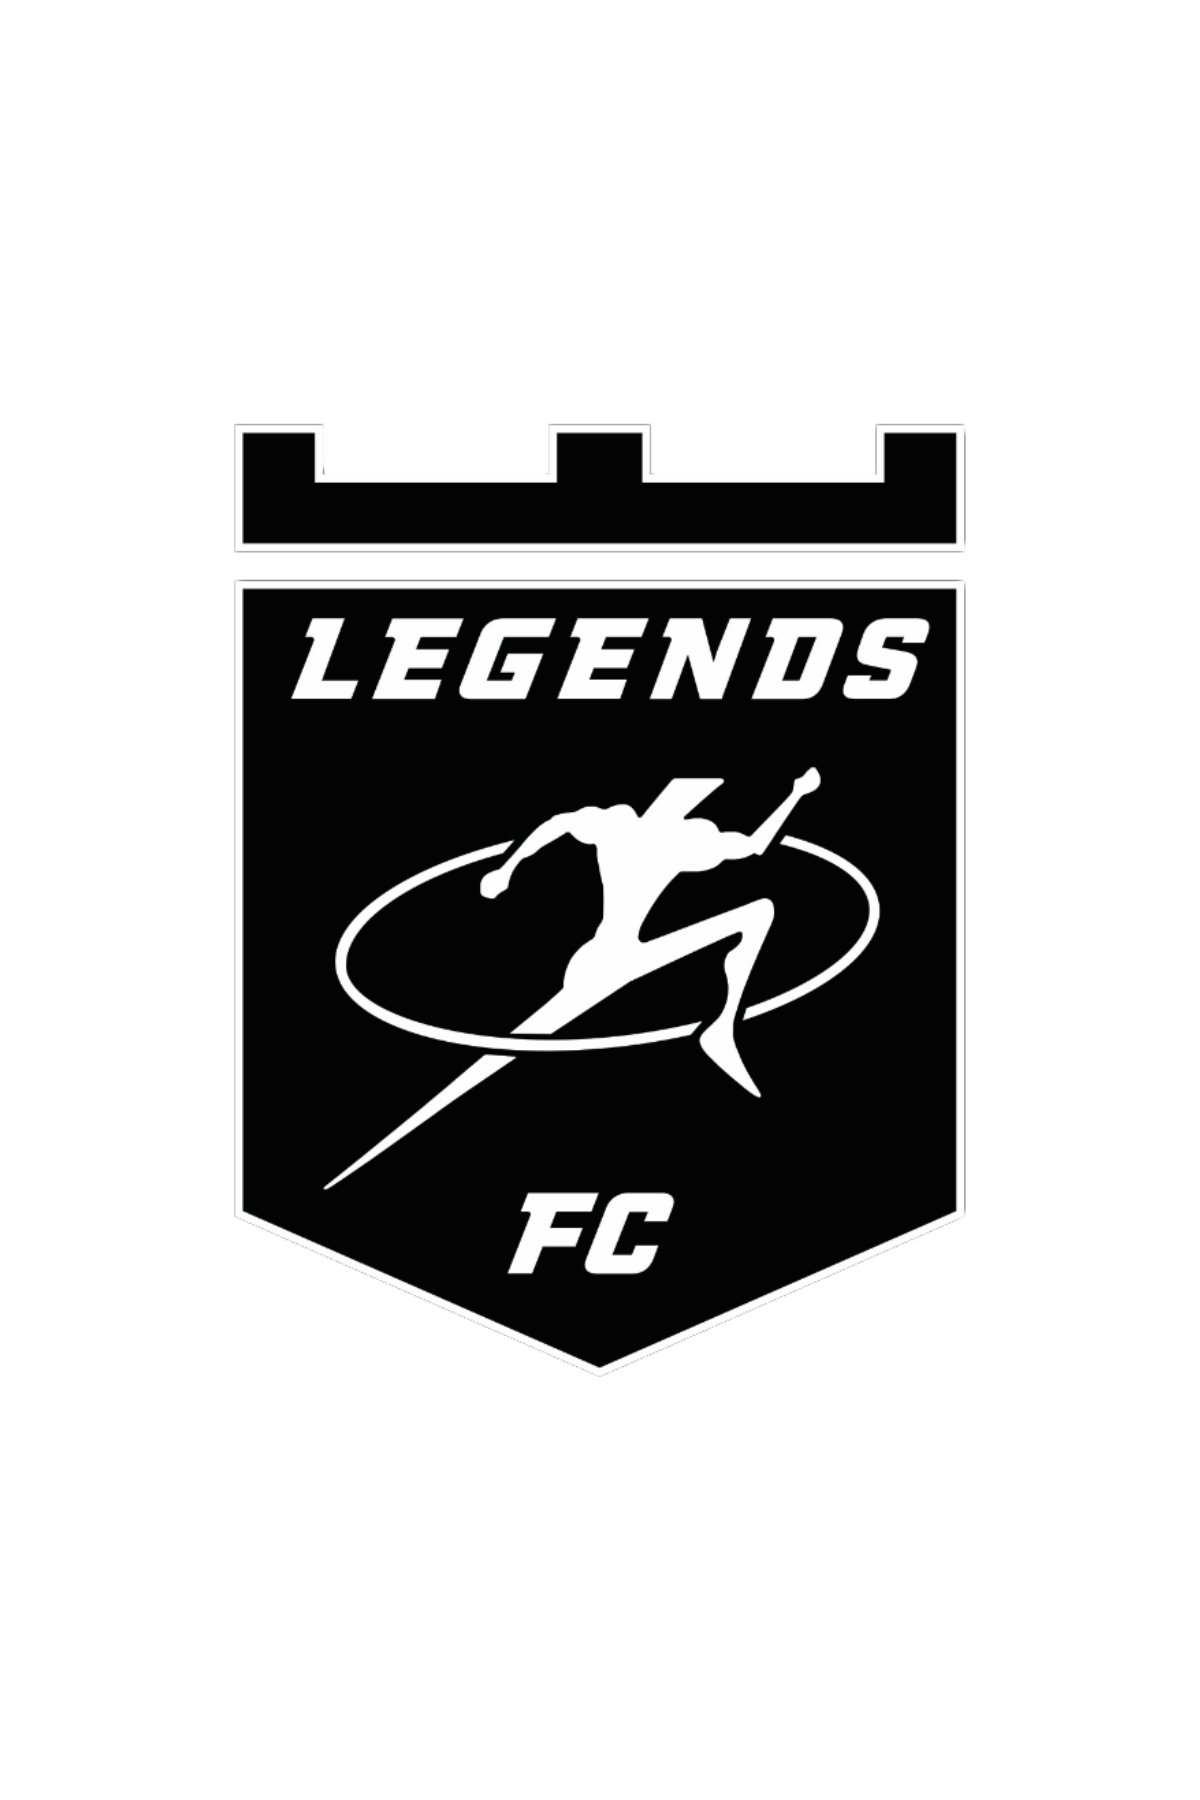 Legends FC | Legacy Center Sports Complex